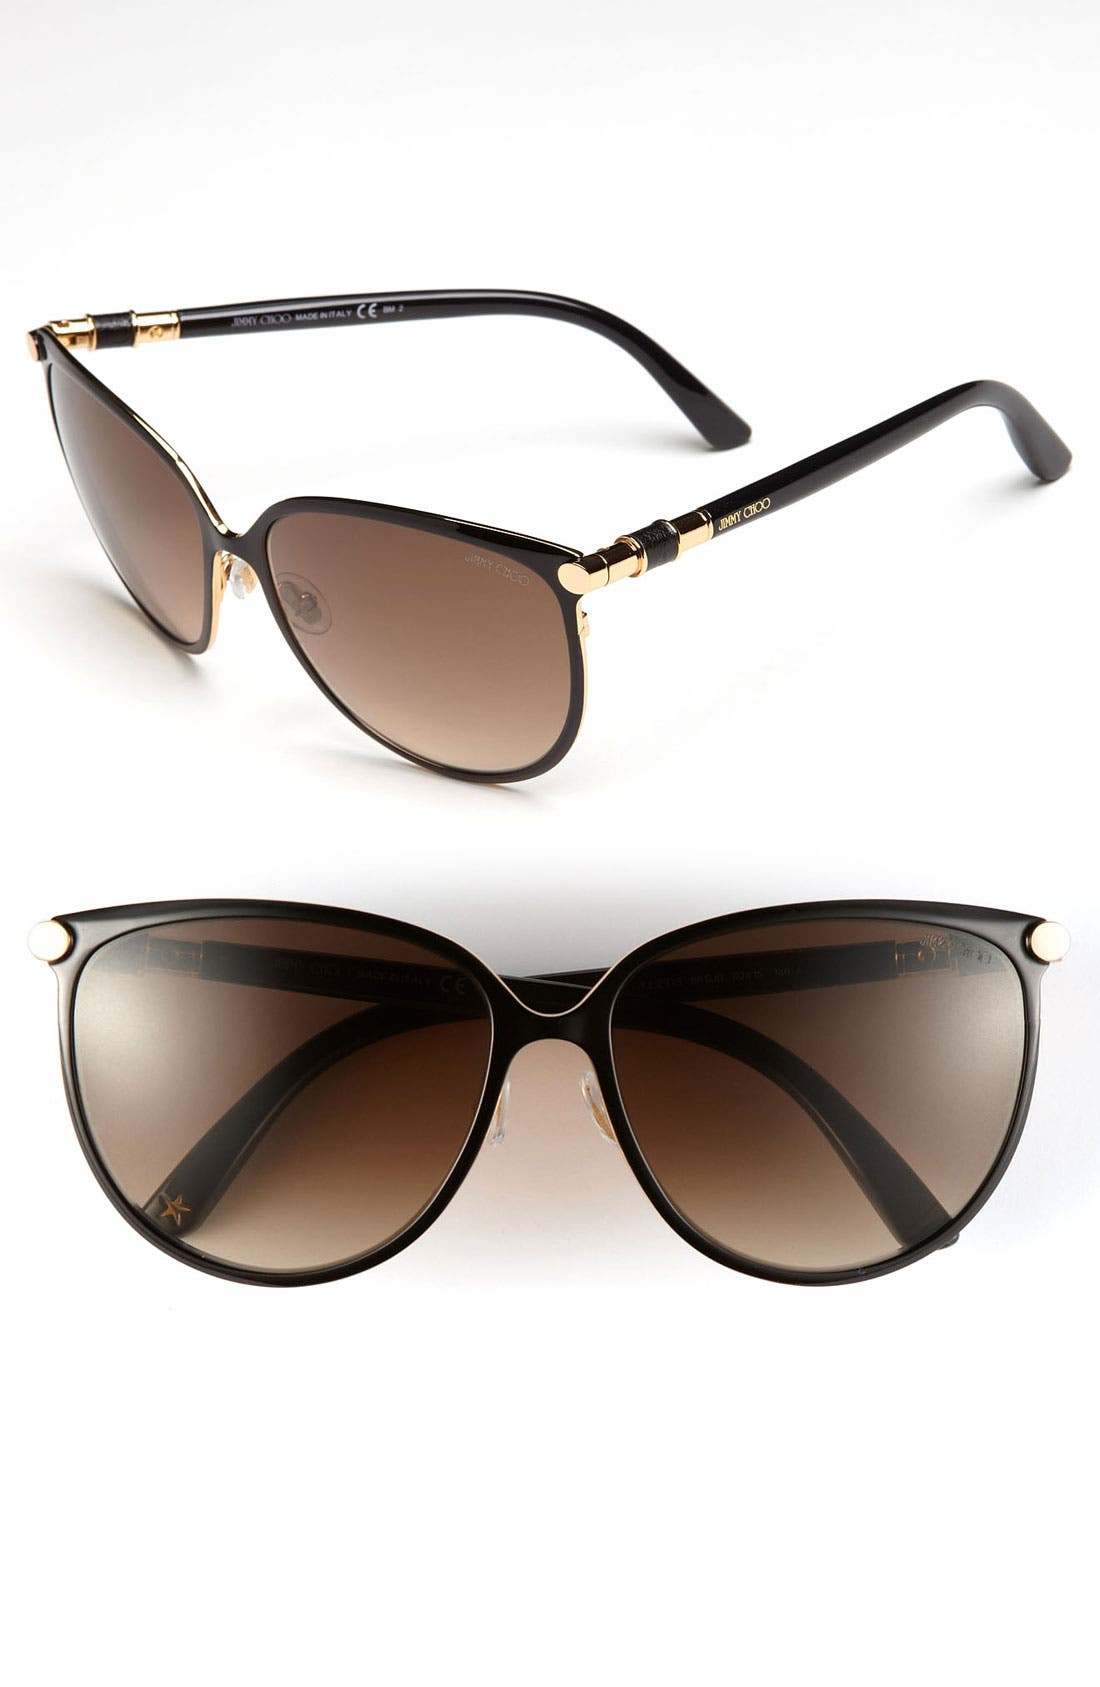 Main Image - Jimmy Choo 'Juliet' 60mm Cat's Eye Sunglasses